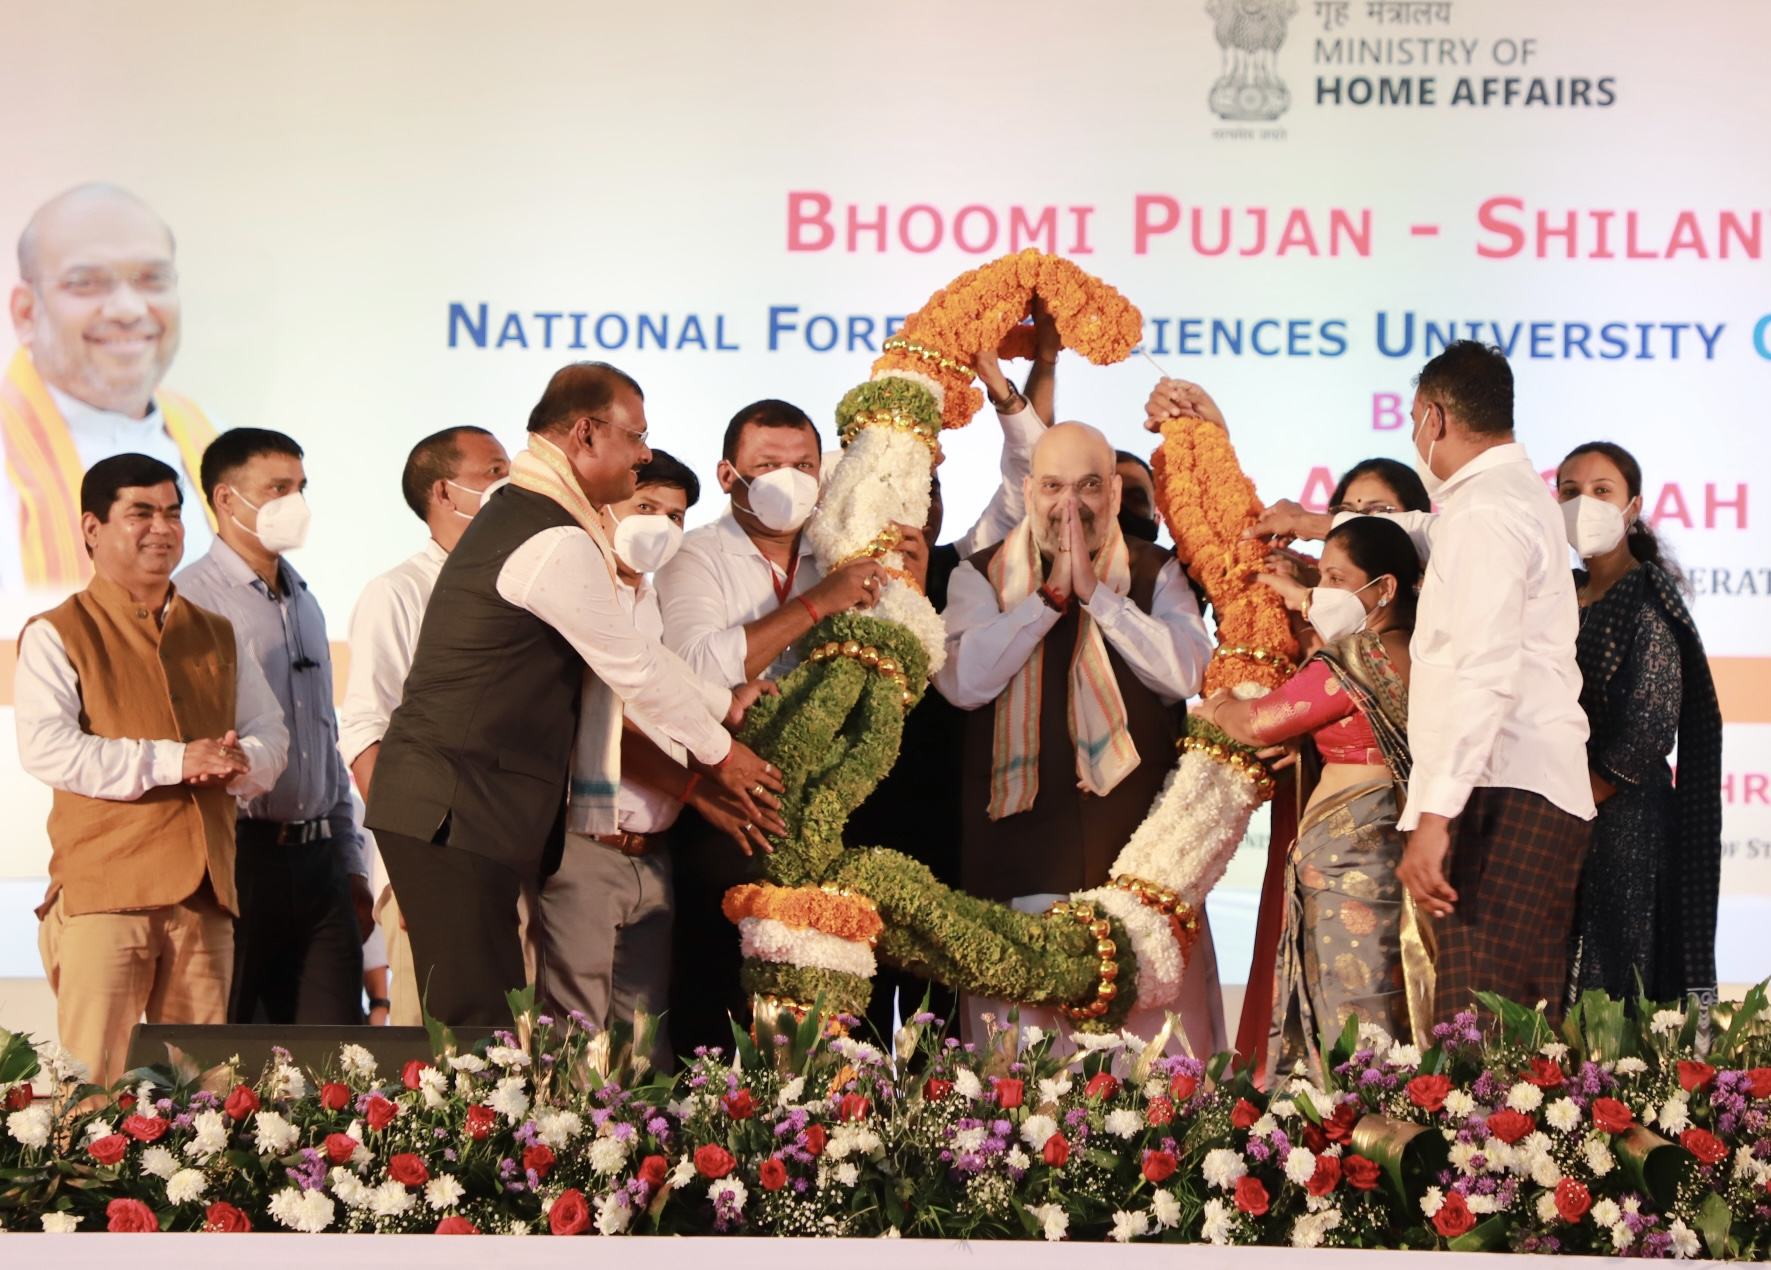 National Forensic Science University (NFSU) at Dharbandora, Goa